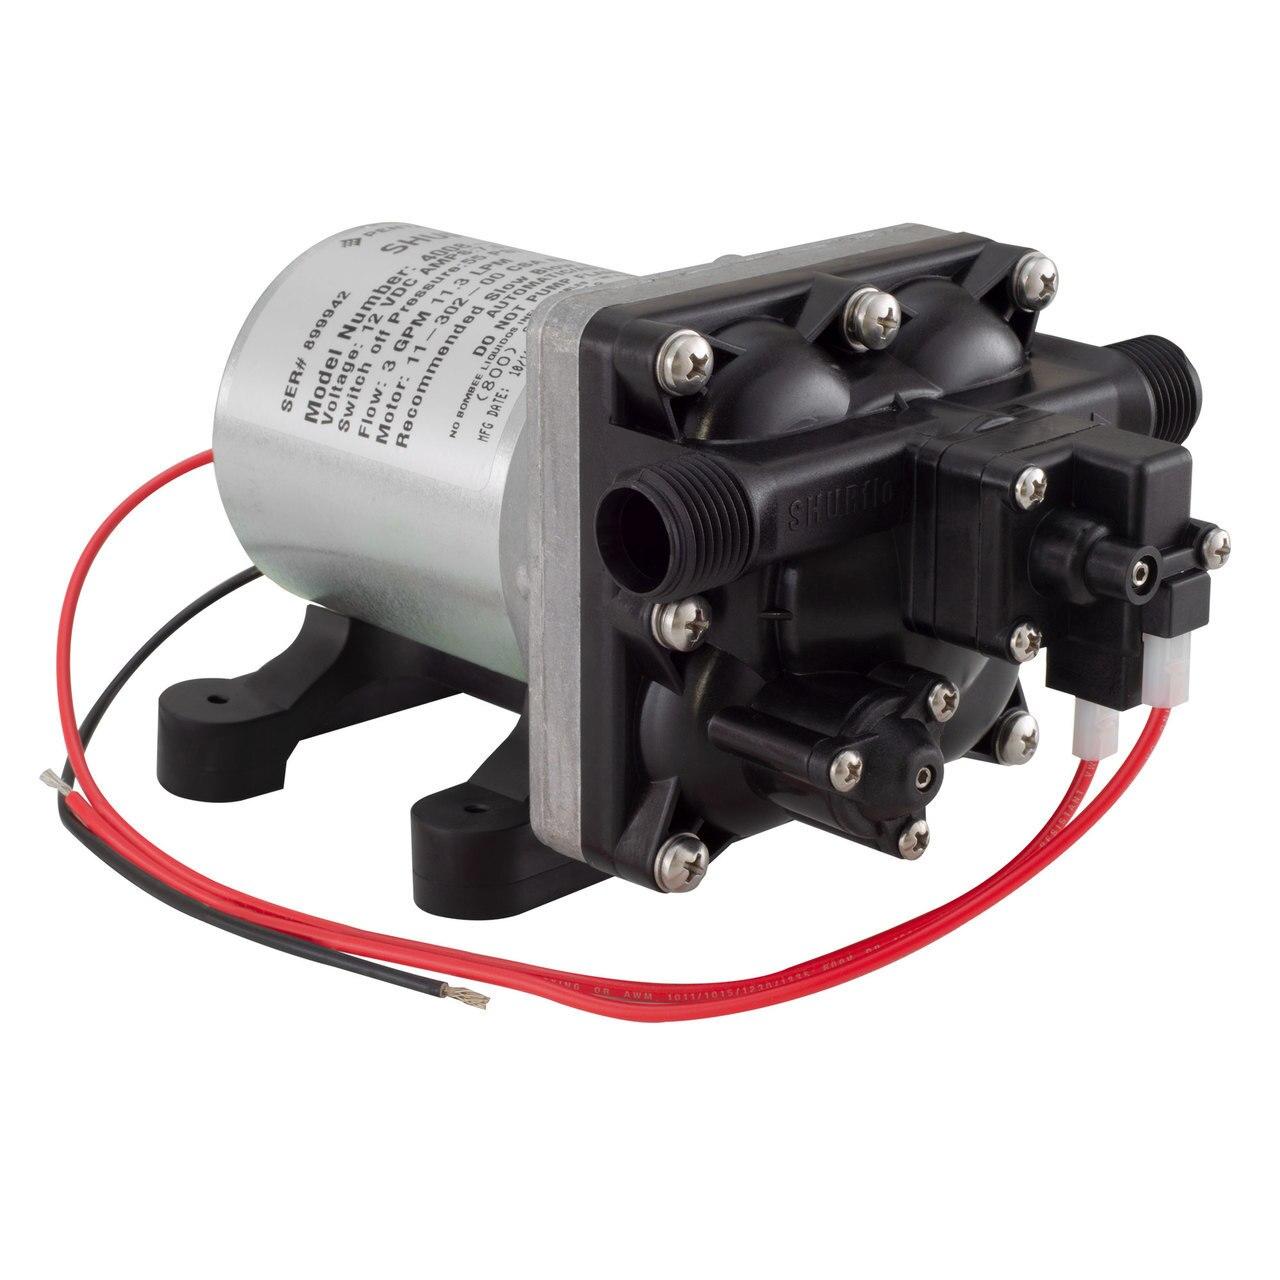 Shurflo Water Pump >> Us 180 0 Shurflo Revolution 4008 101 A65 Rv Fresh Water Pump 12v Dc 3gpm 11 3l Min 60psi Diaphragm Pump High Flow High Pressure Suck 1 8m In Pumps